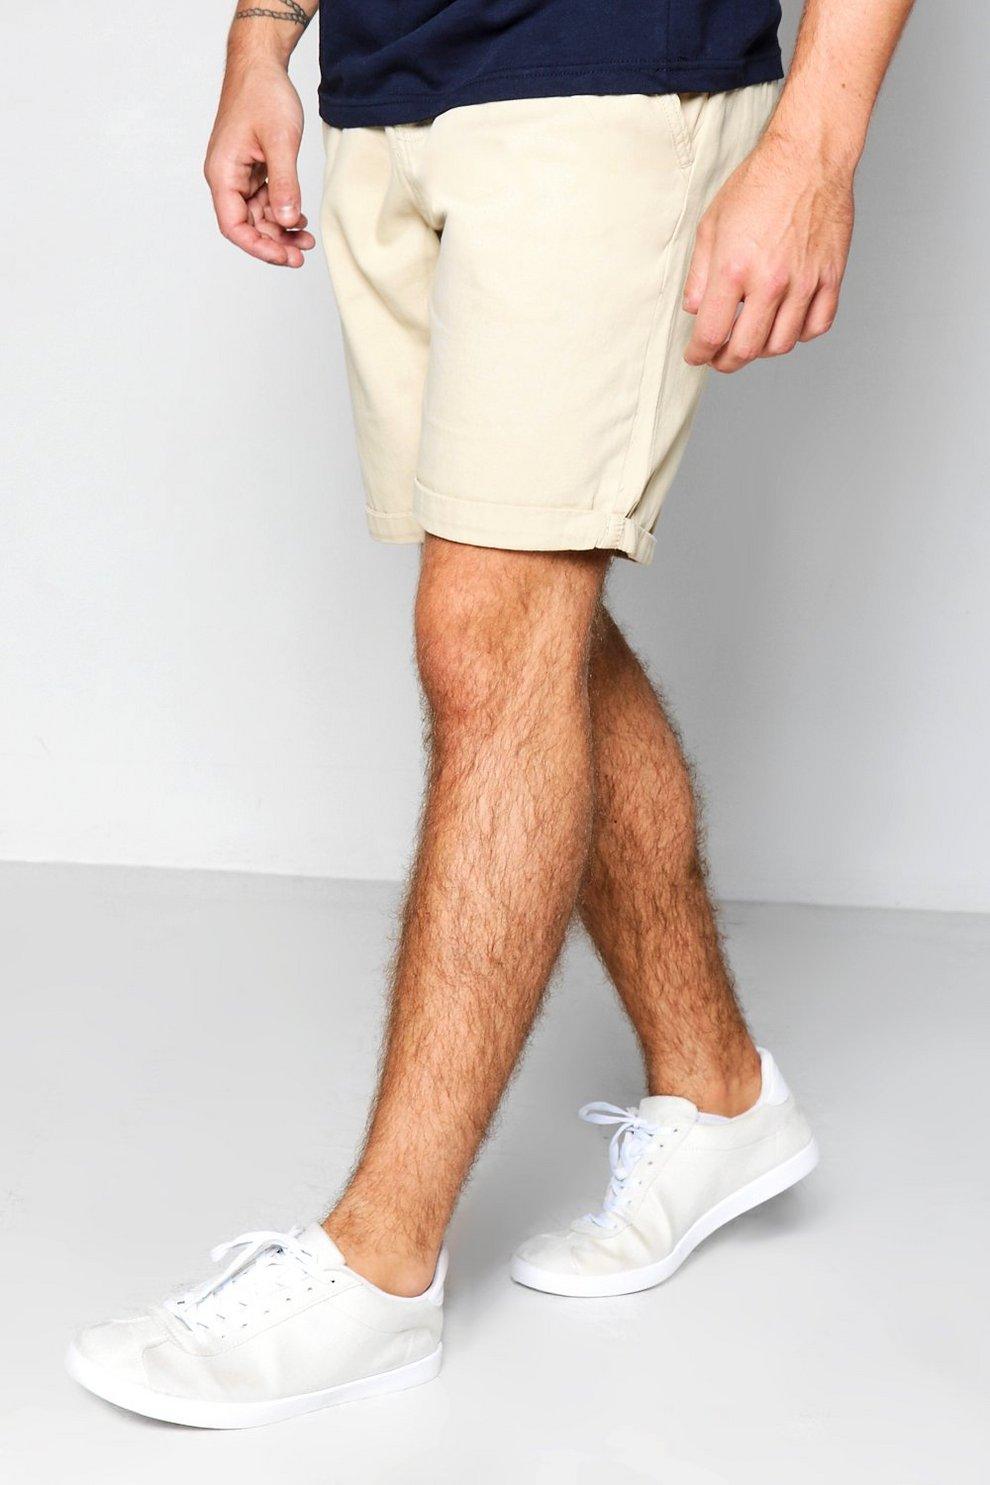 Boohoo Stone Plain Chino Shorts Buy Cheap Shop Offer eSUpfq7Vg